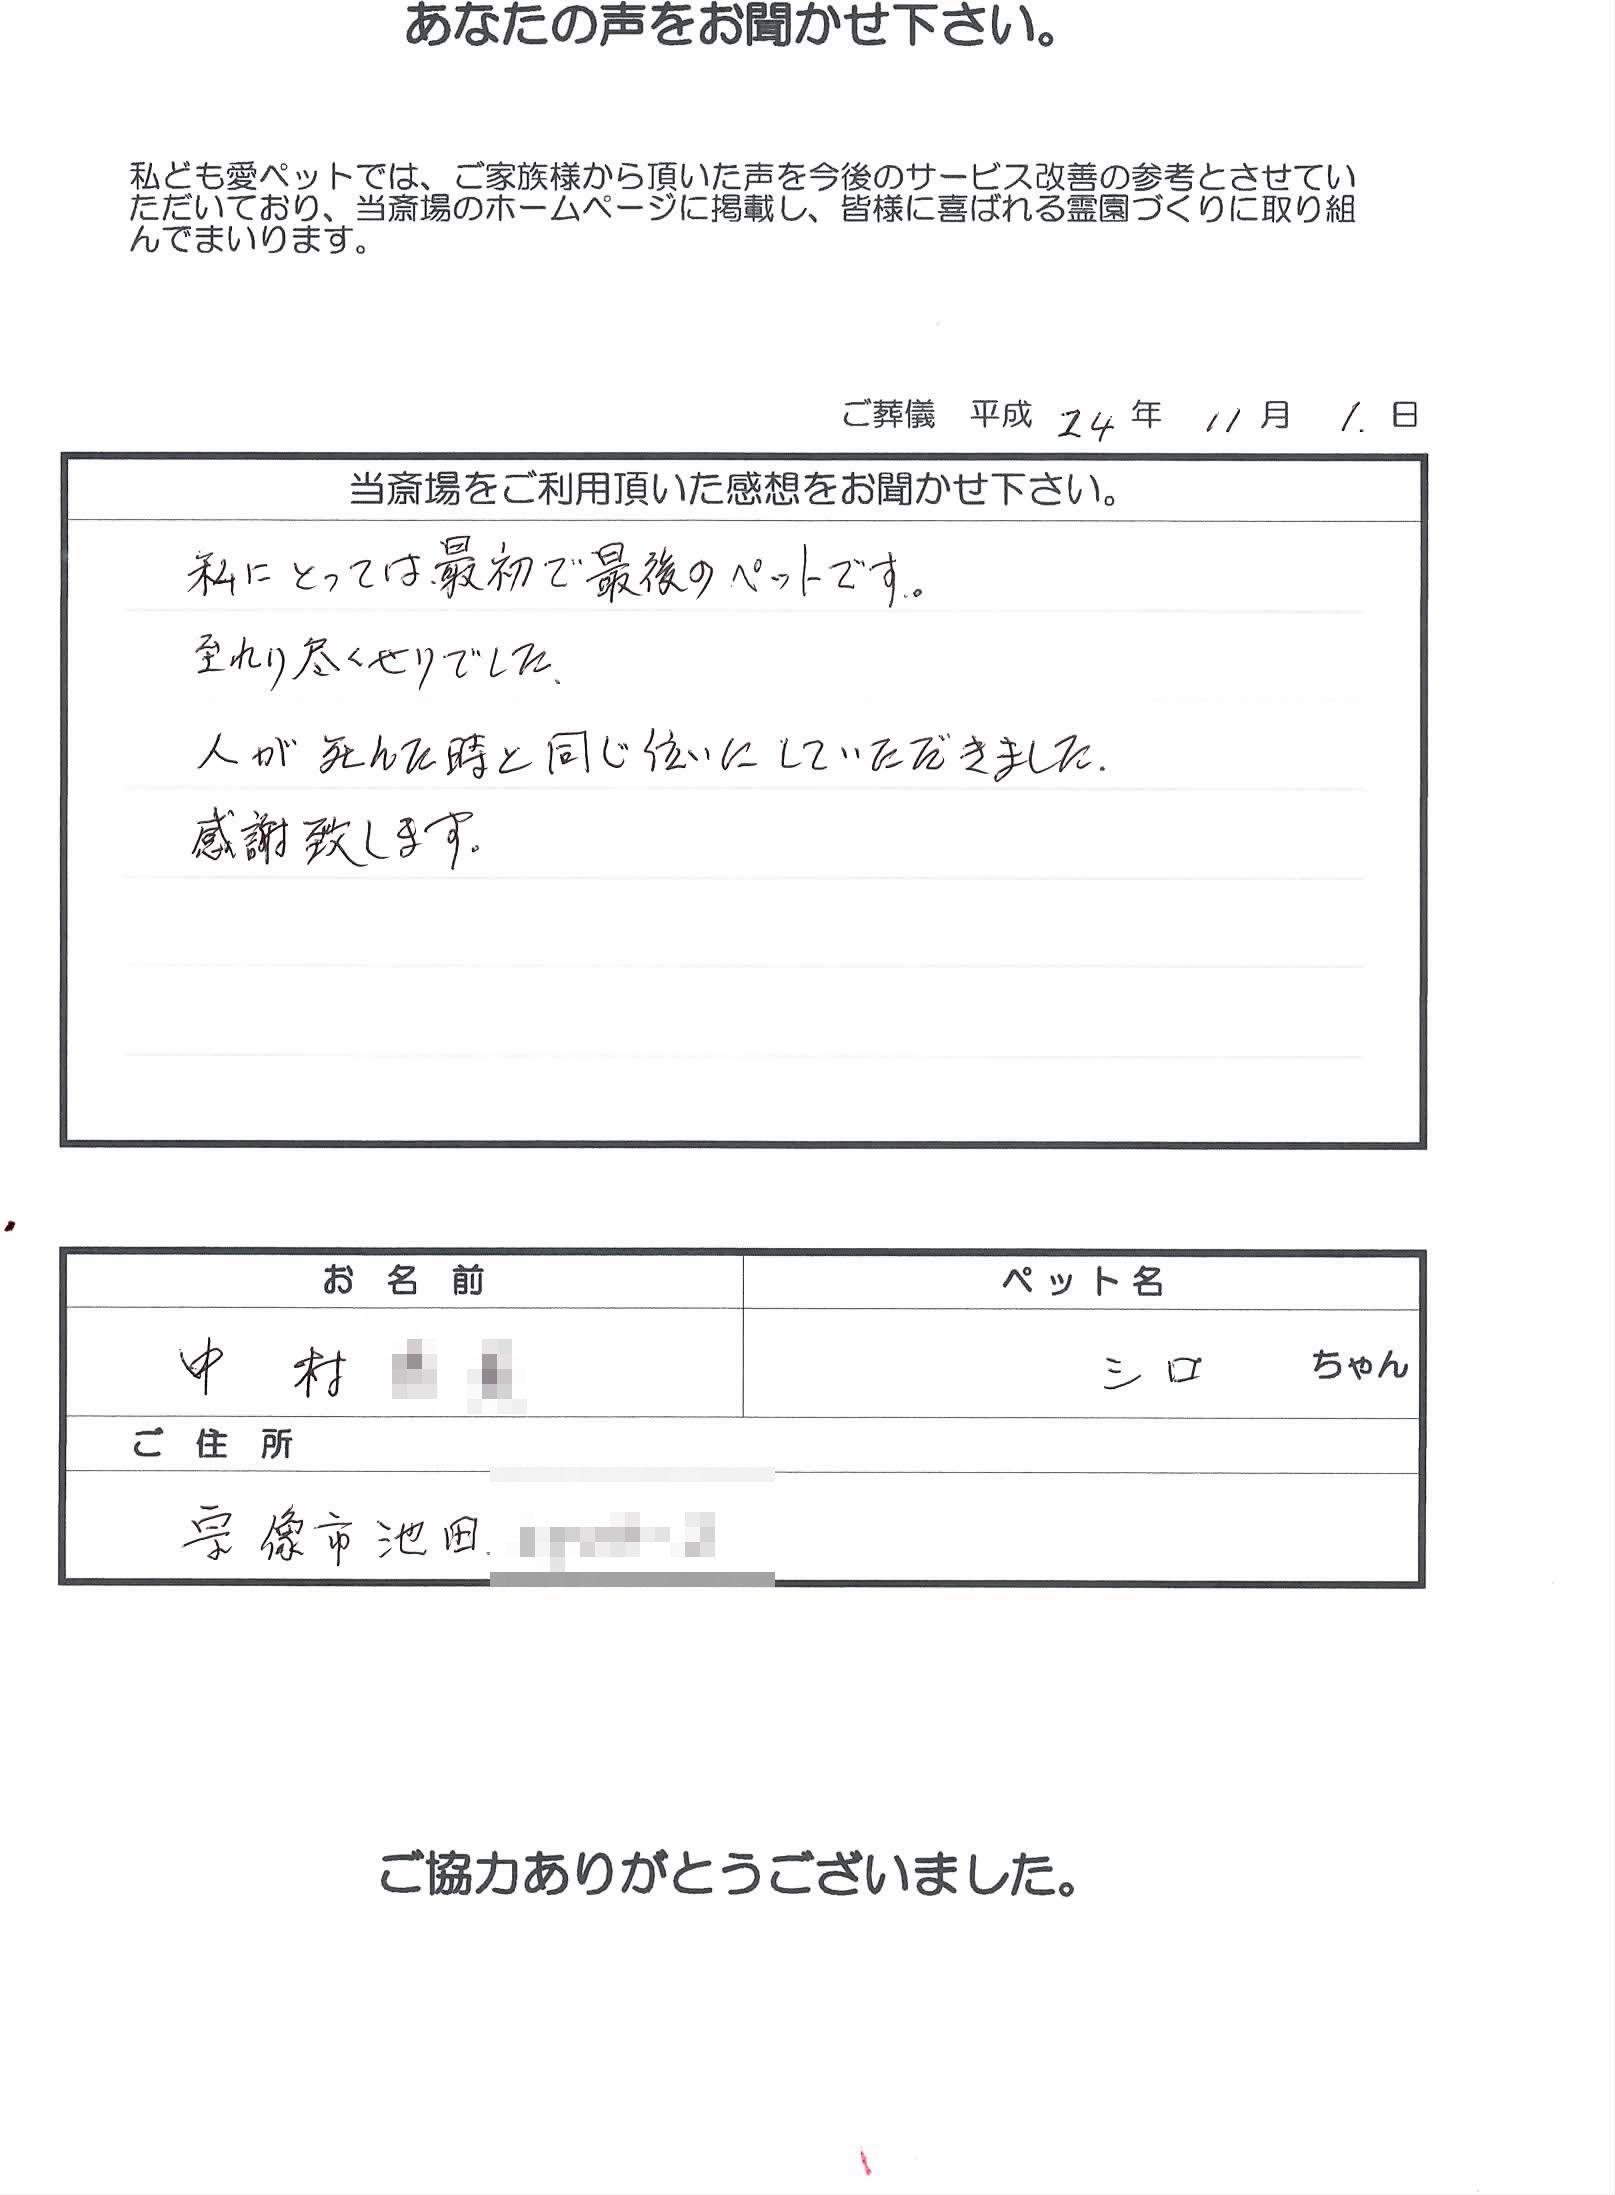 k121101-2.jpg